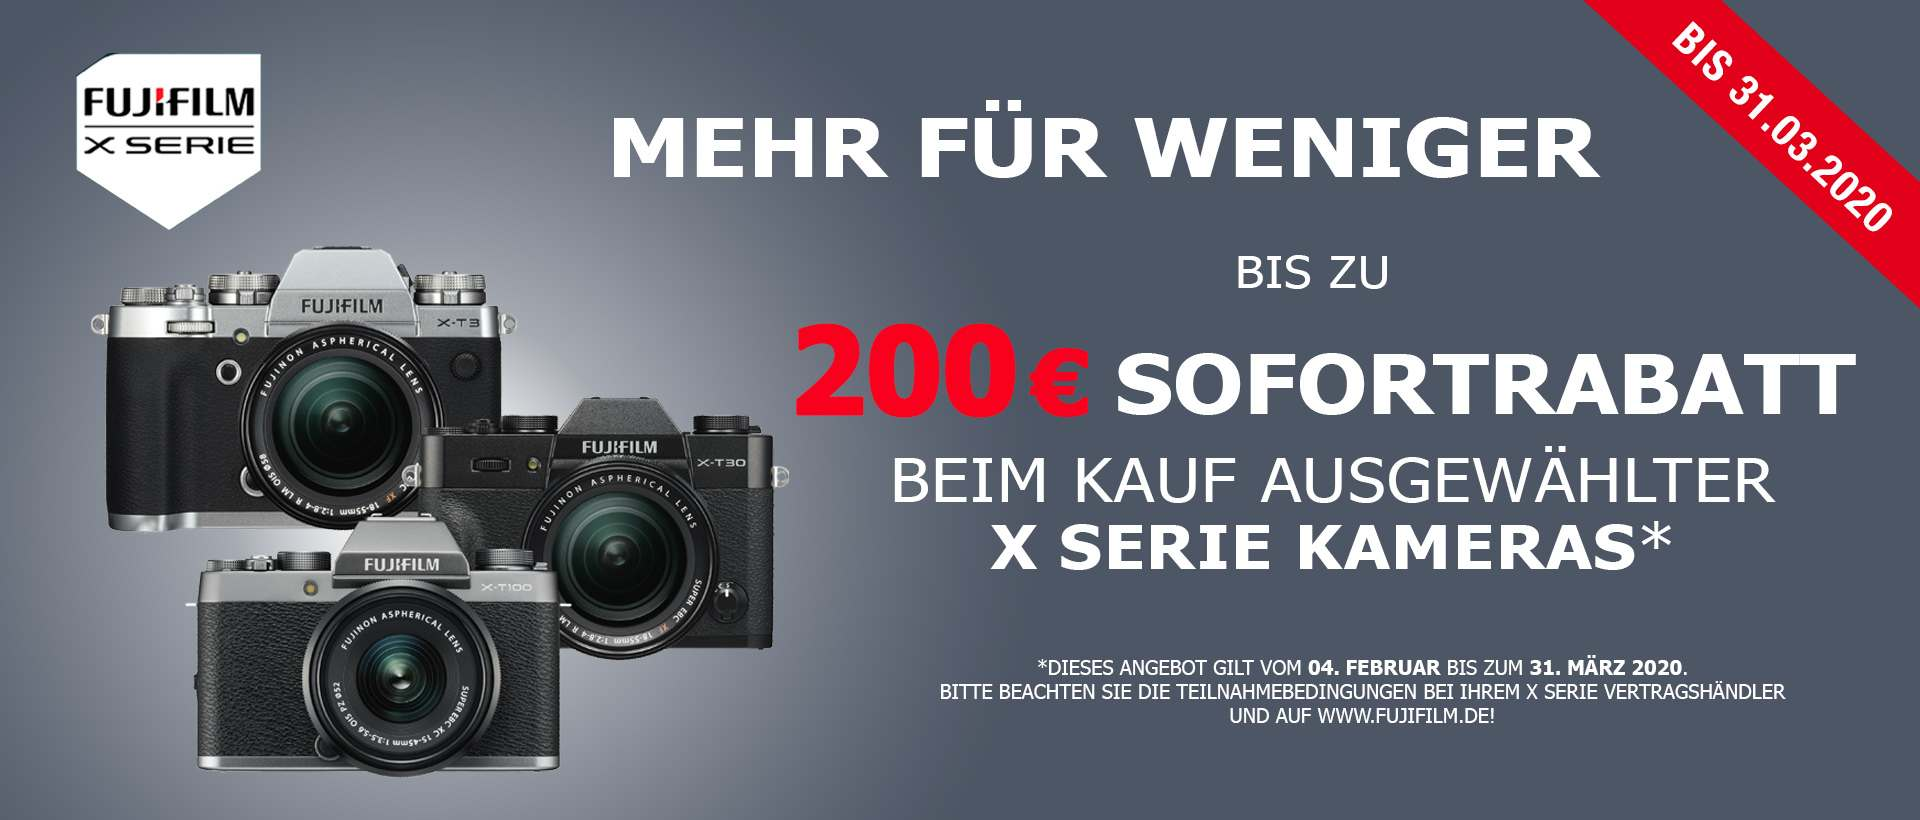 Fujifilm X Serie Sofortrabatt Aktion